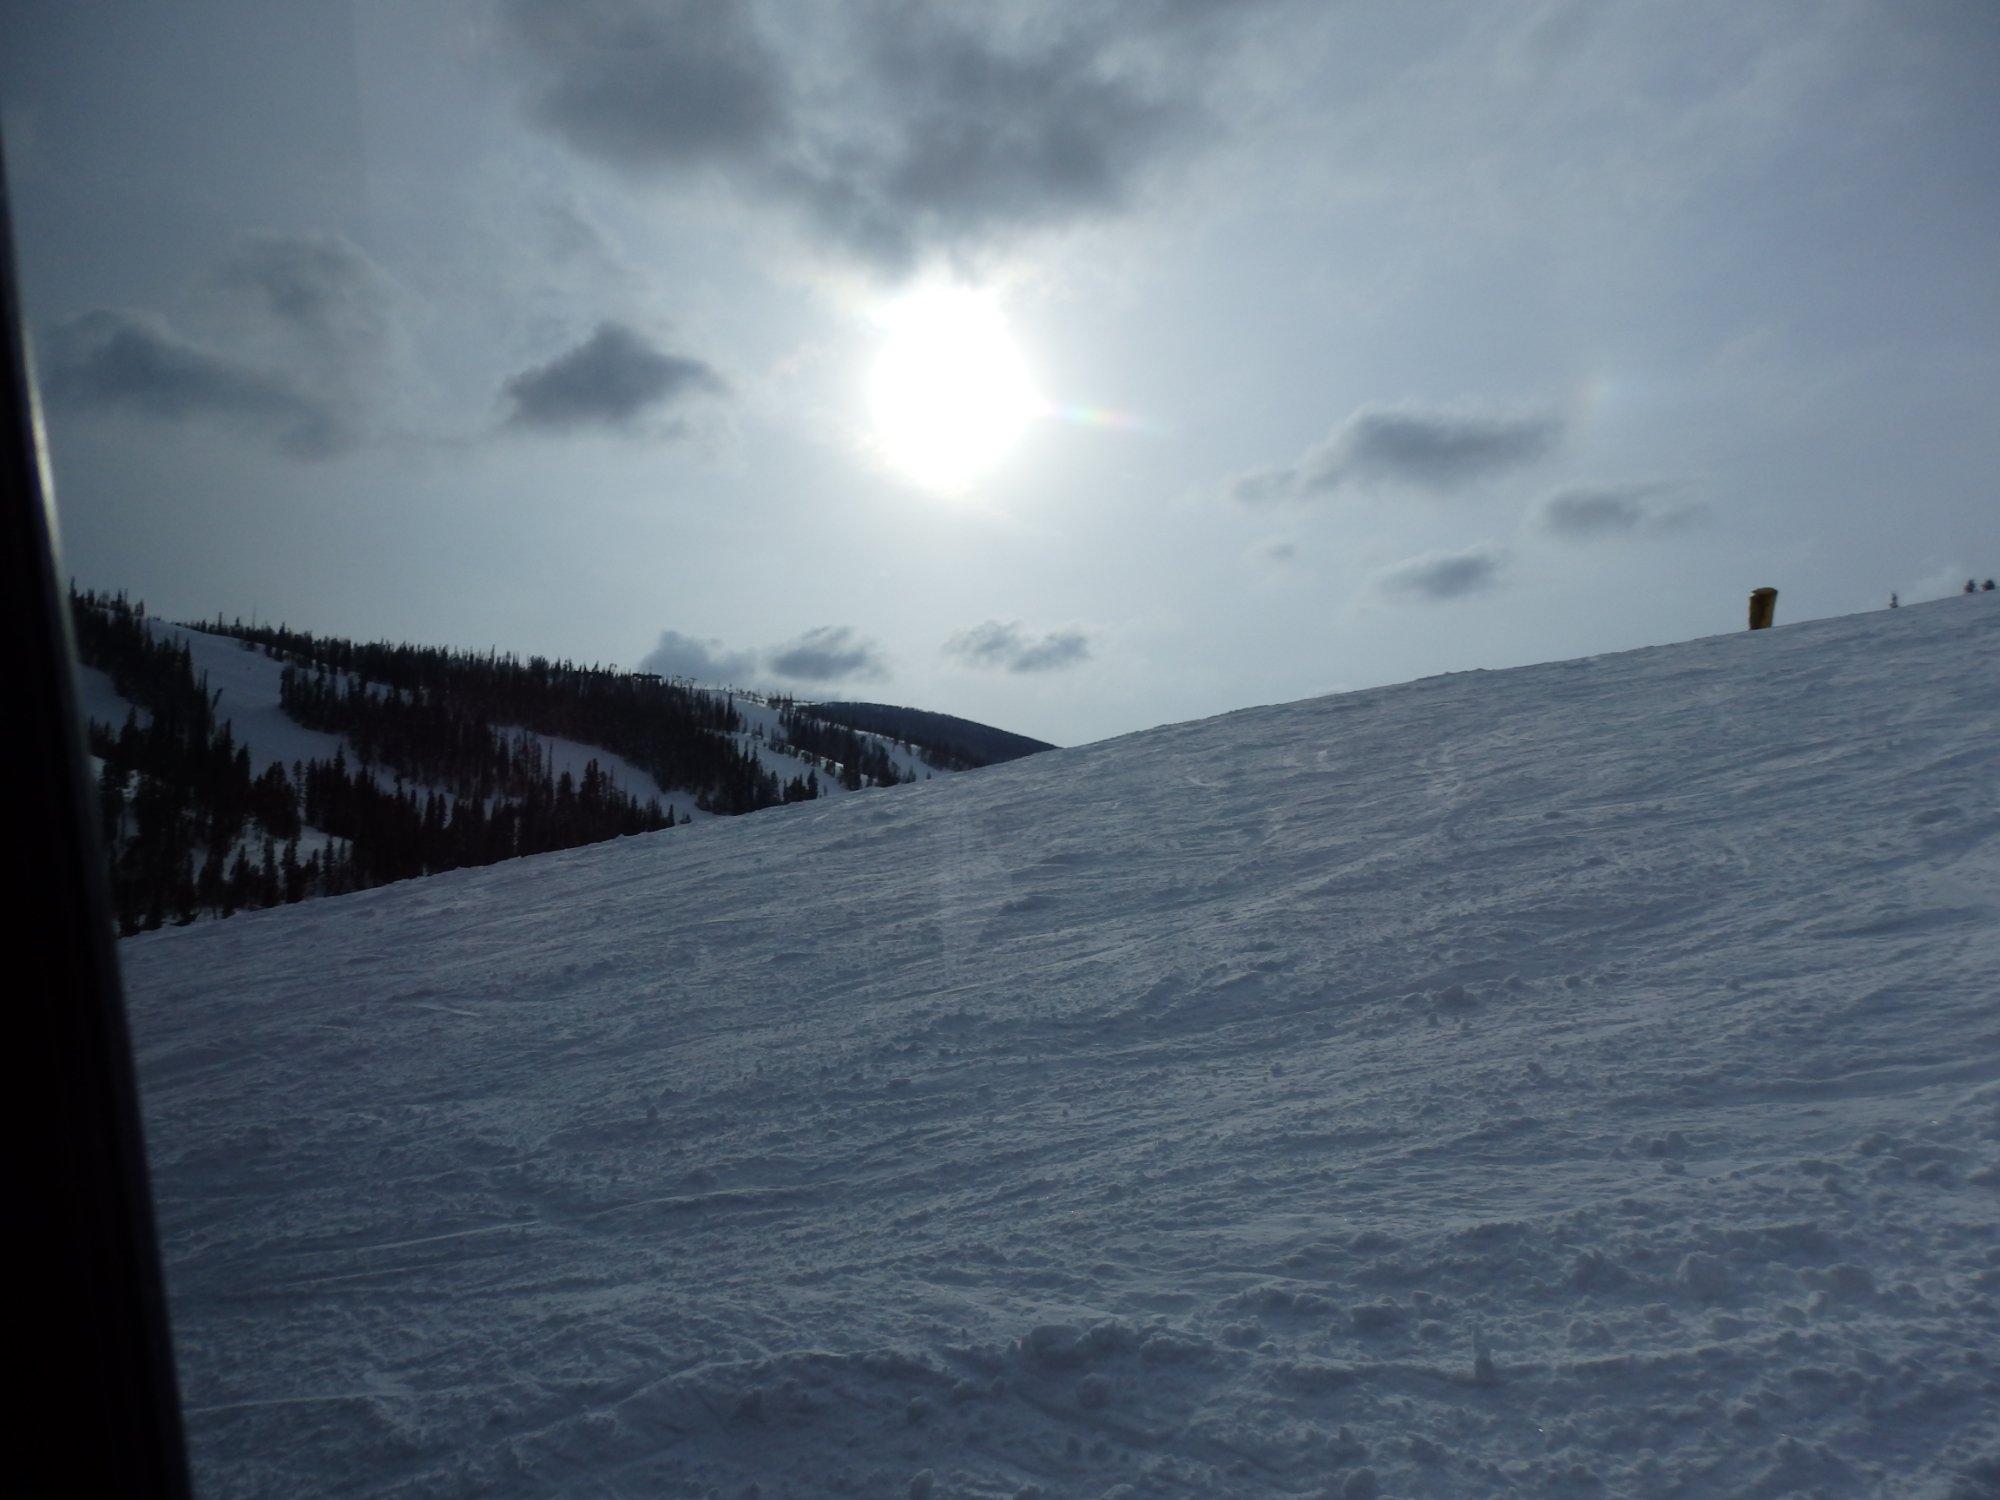 10000 feet up at Winter Park